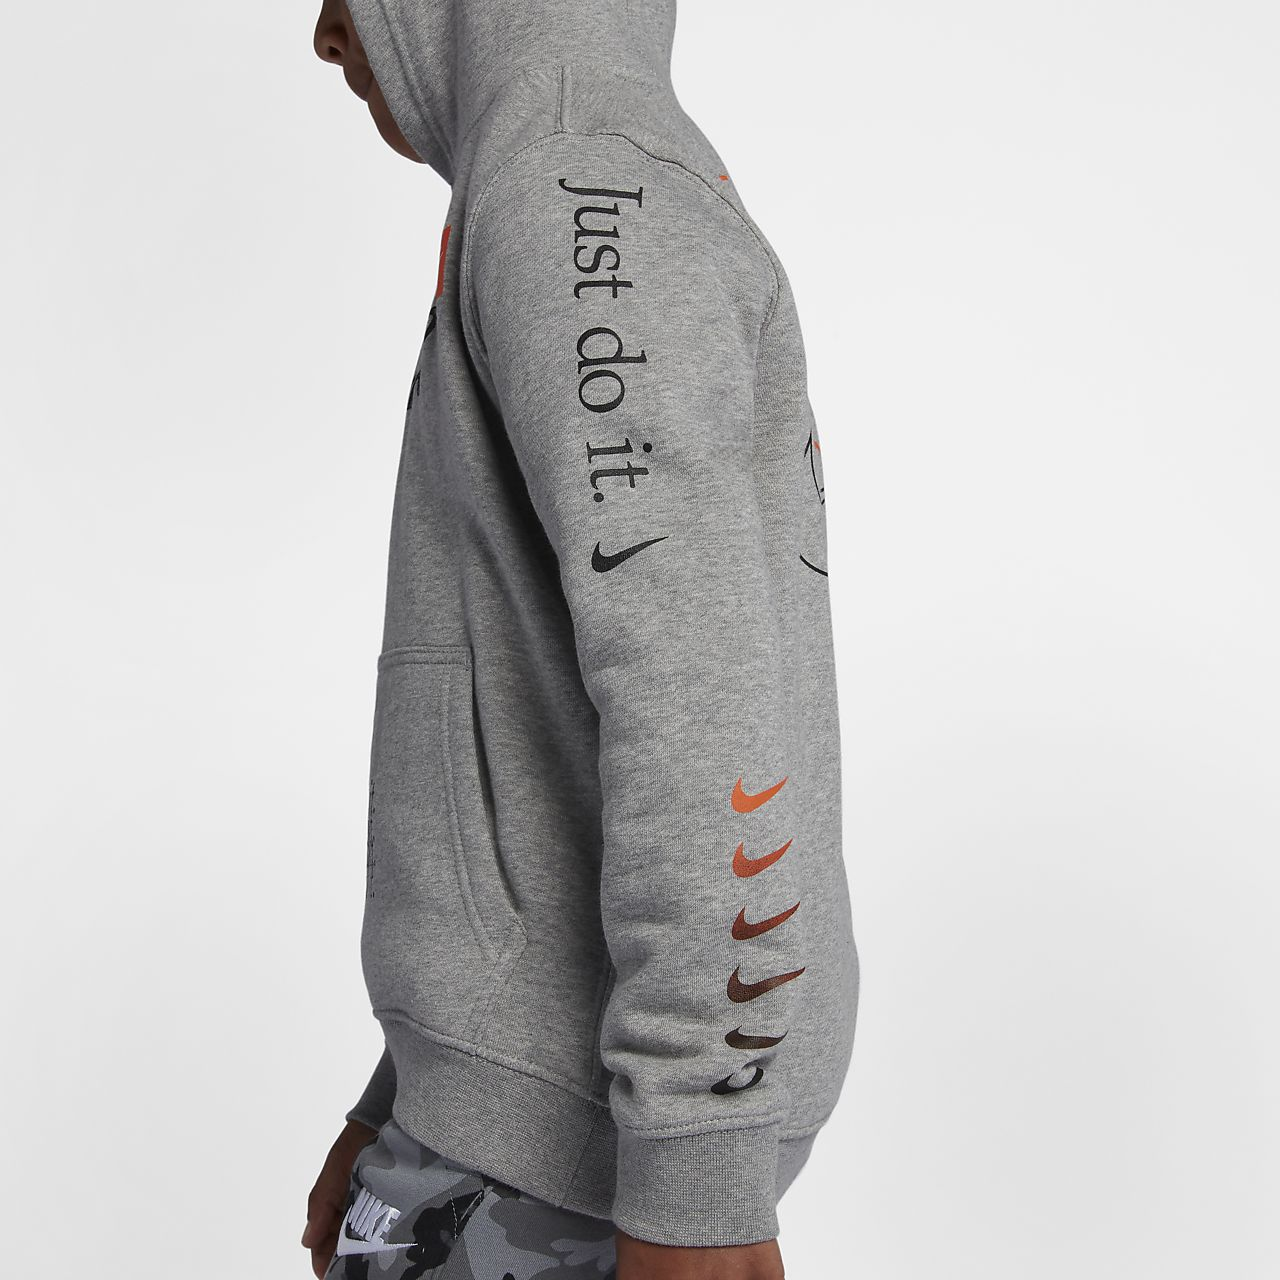 8db0d379259e Nike Sportswear Big Kids  (Boys ) Just Do It Pullover Hoodie. Nike.com